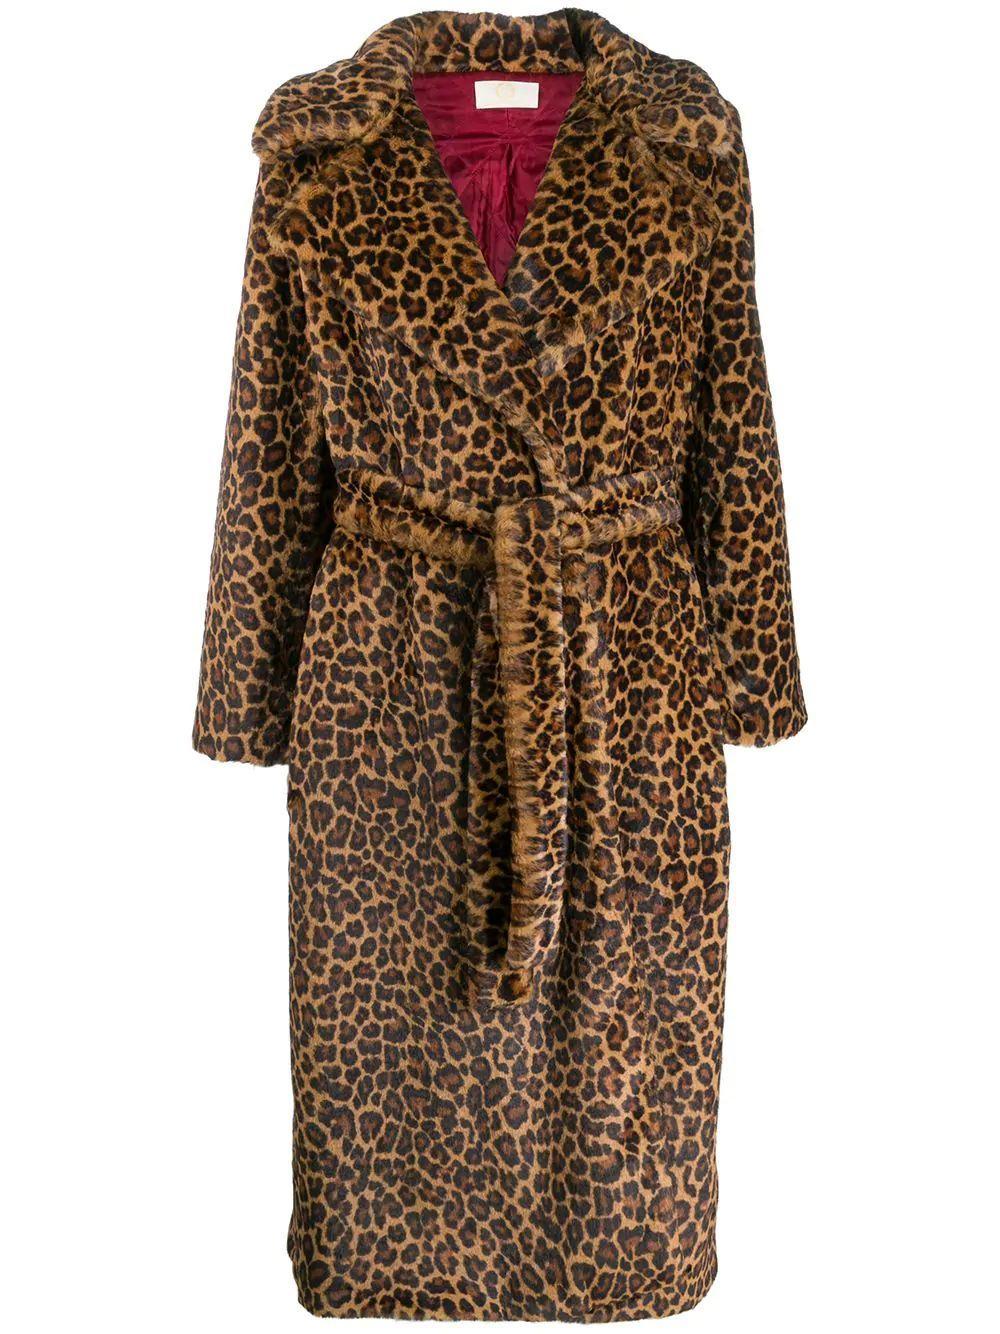 Long Faux Fur Coat Item # SB8006325W0